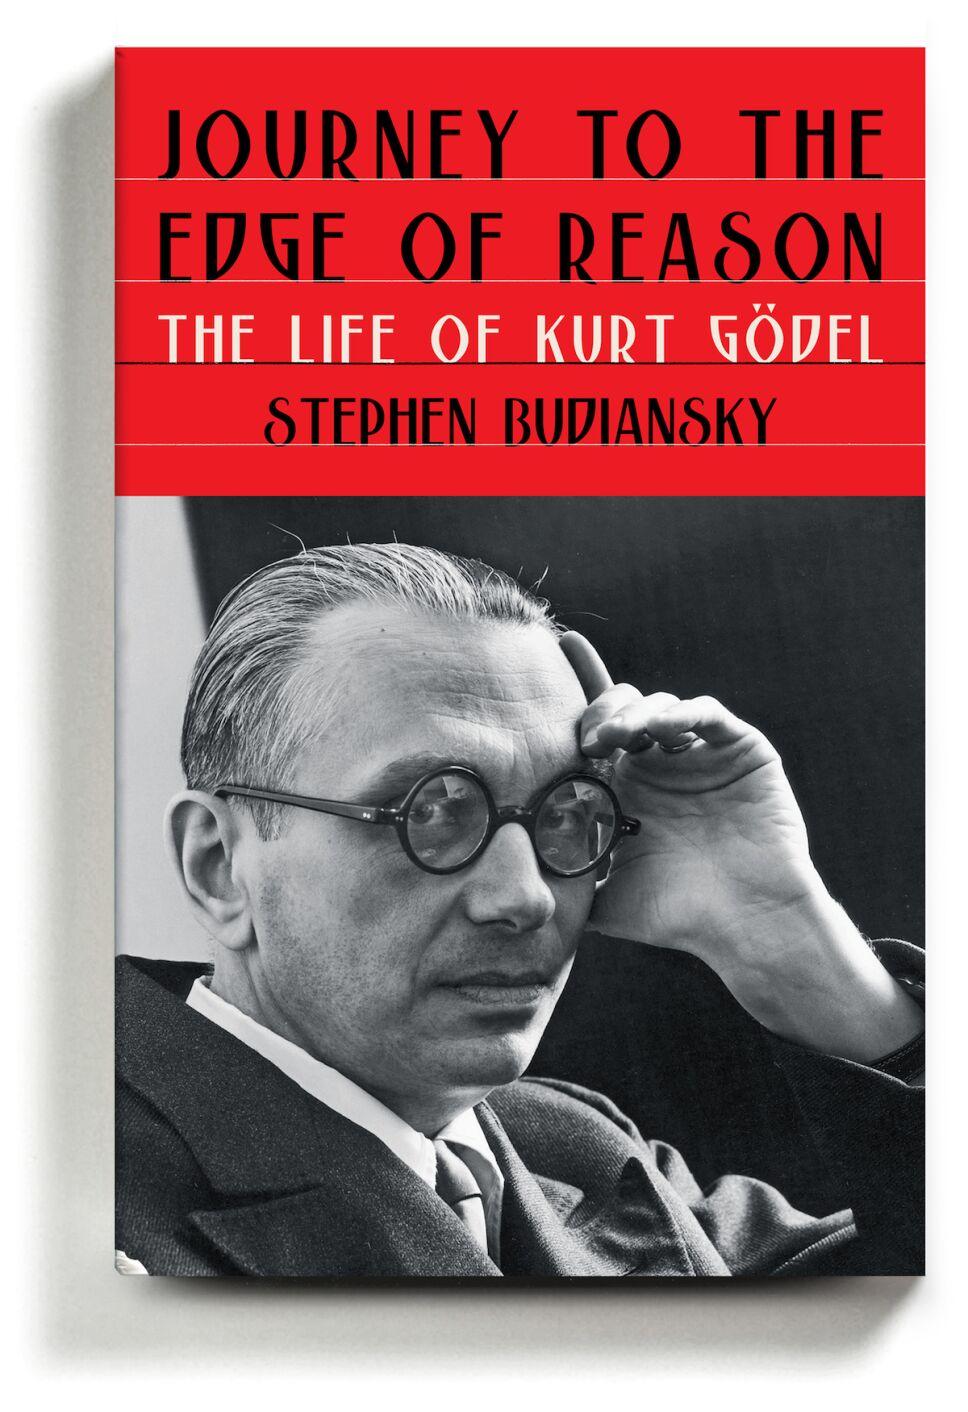 Journey to the edge of reason stephen budiansky